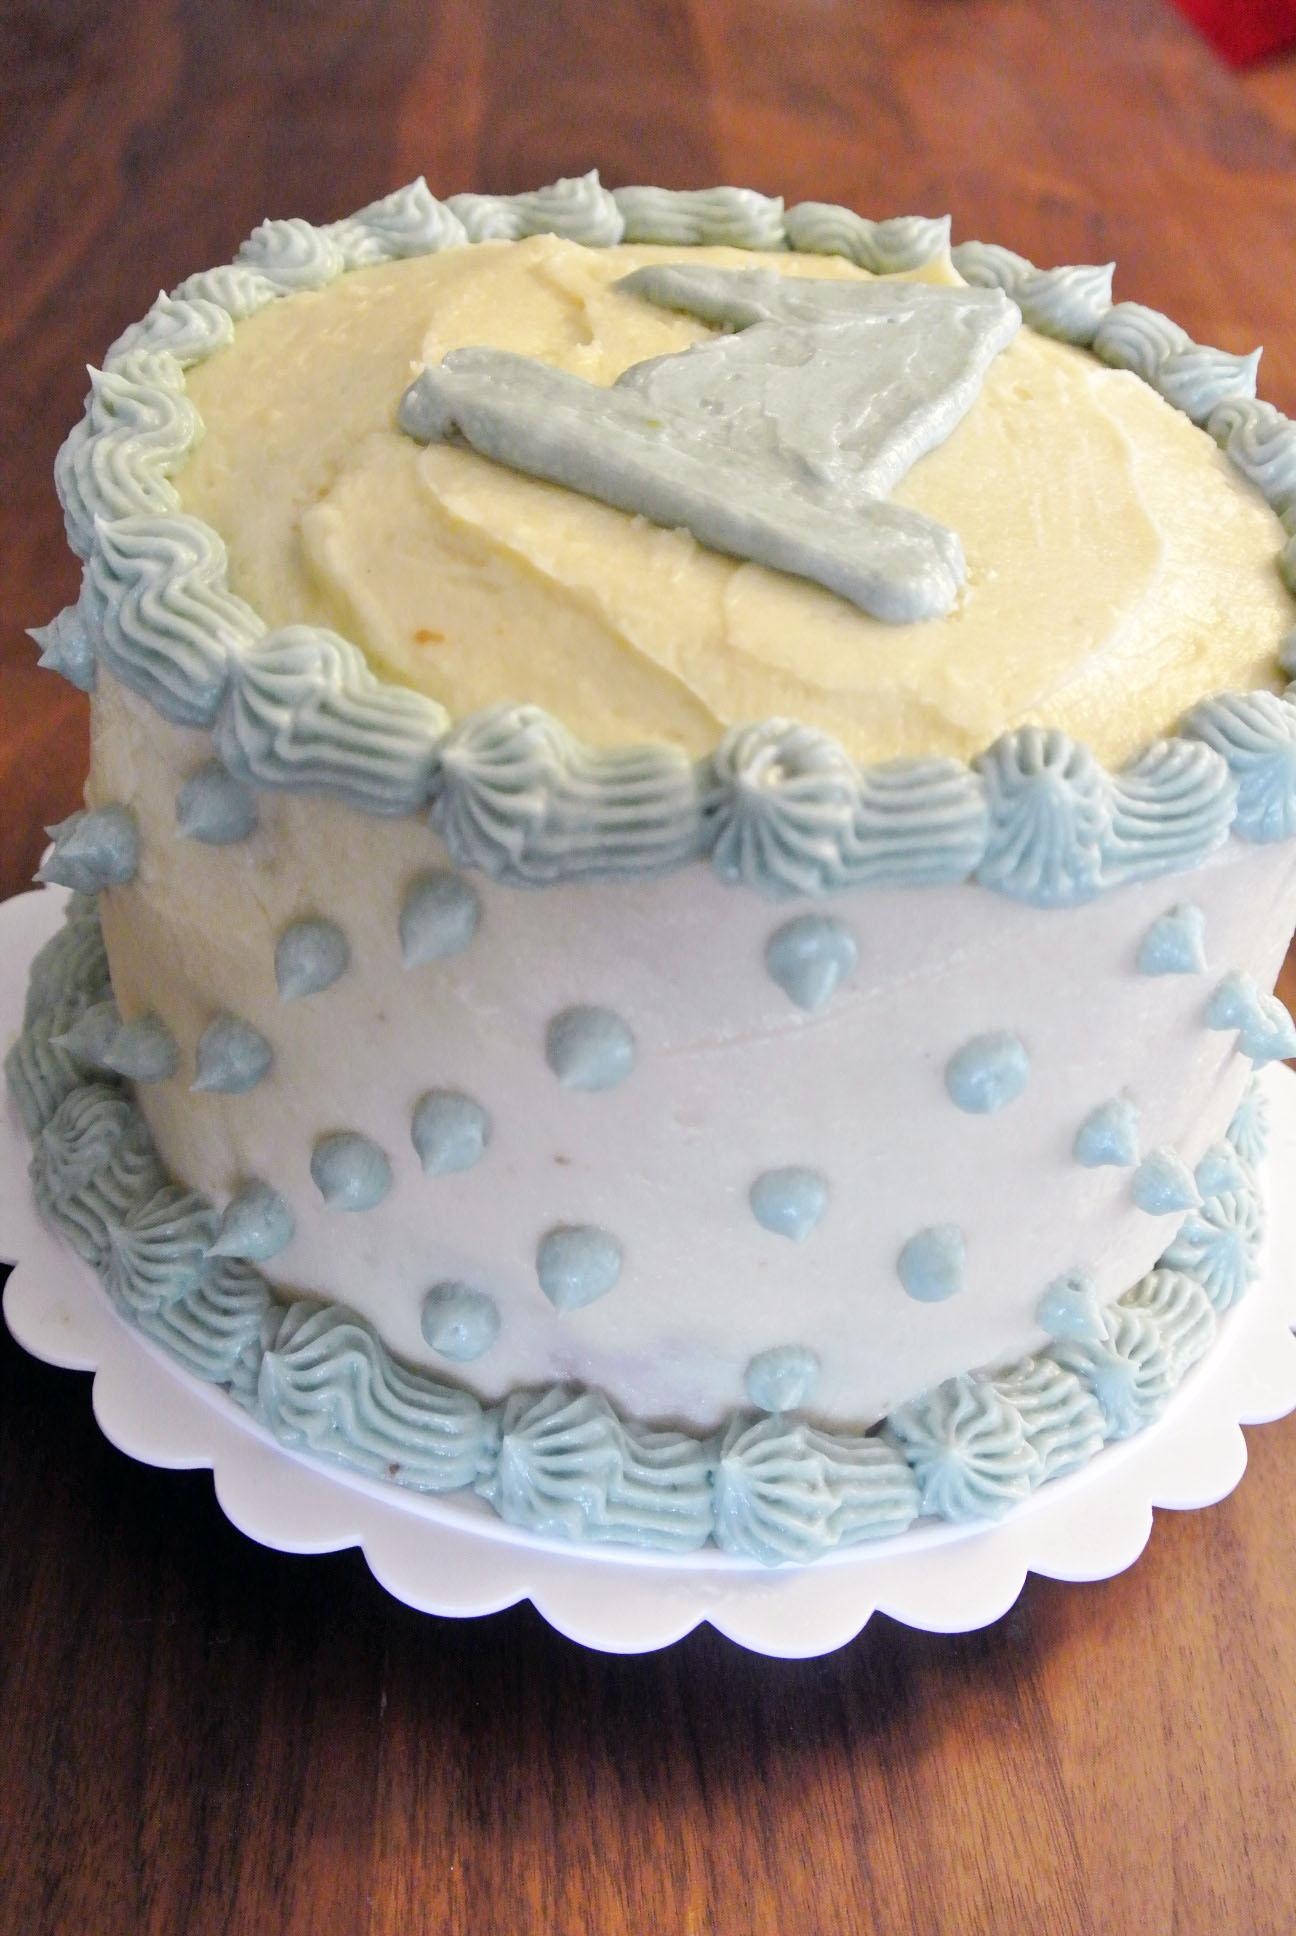 "Organic, Allergen Free, Low Sugar, Carrot, Zucchini Spice 1st Birthday ""Smash"" Cake; Gluten Free, Dairy Free, Soy Free, Corn Free, Nut Free, Egg Free, Chocolate Free"